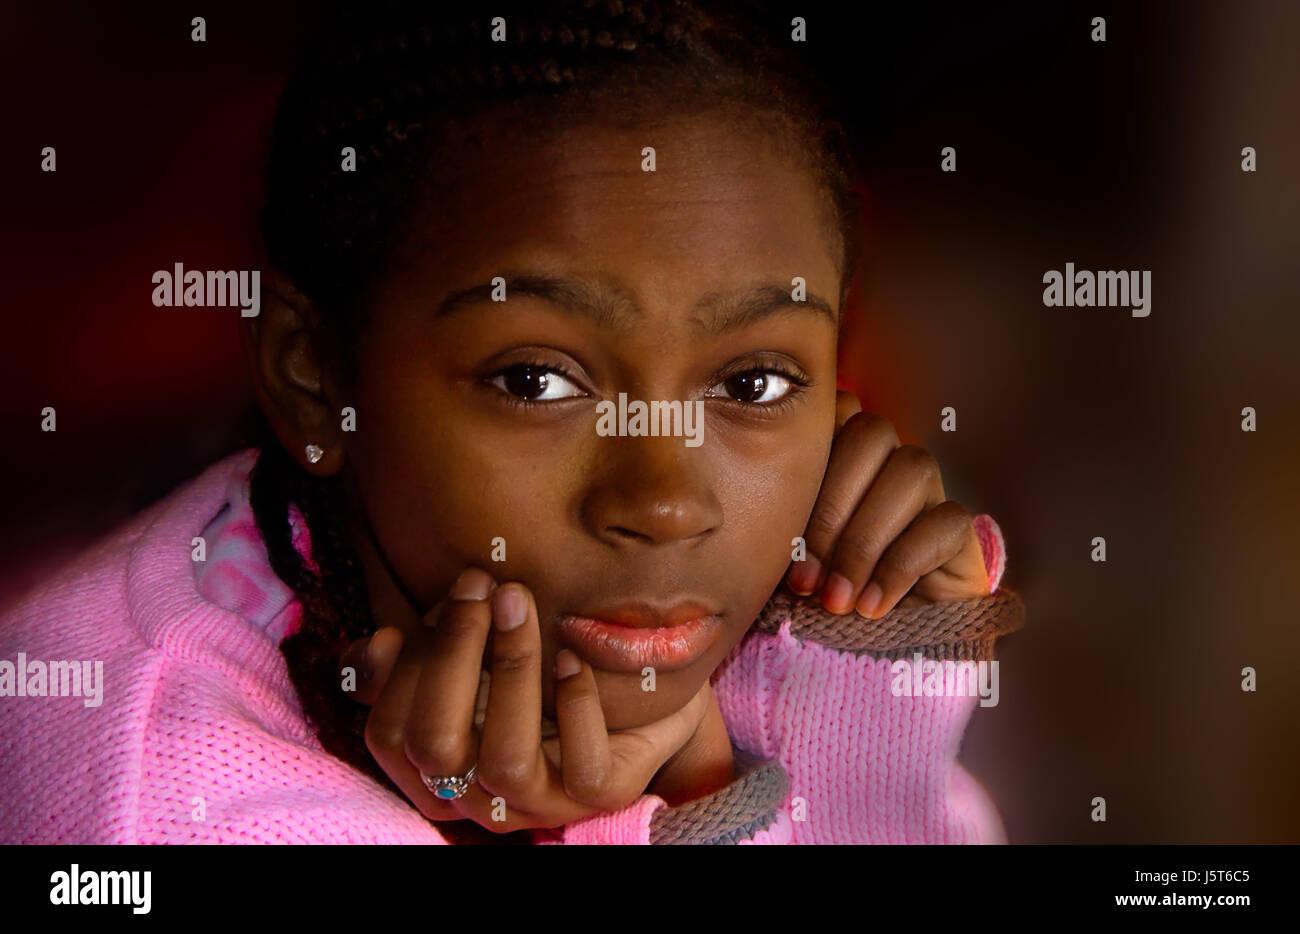 teen portrait meditate black blackness reflexion girl girls portrait black eyes - Stock Image